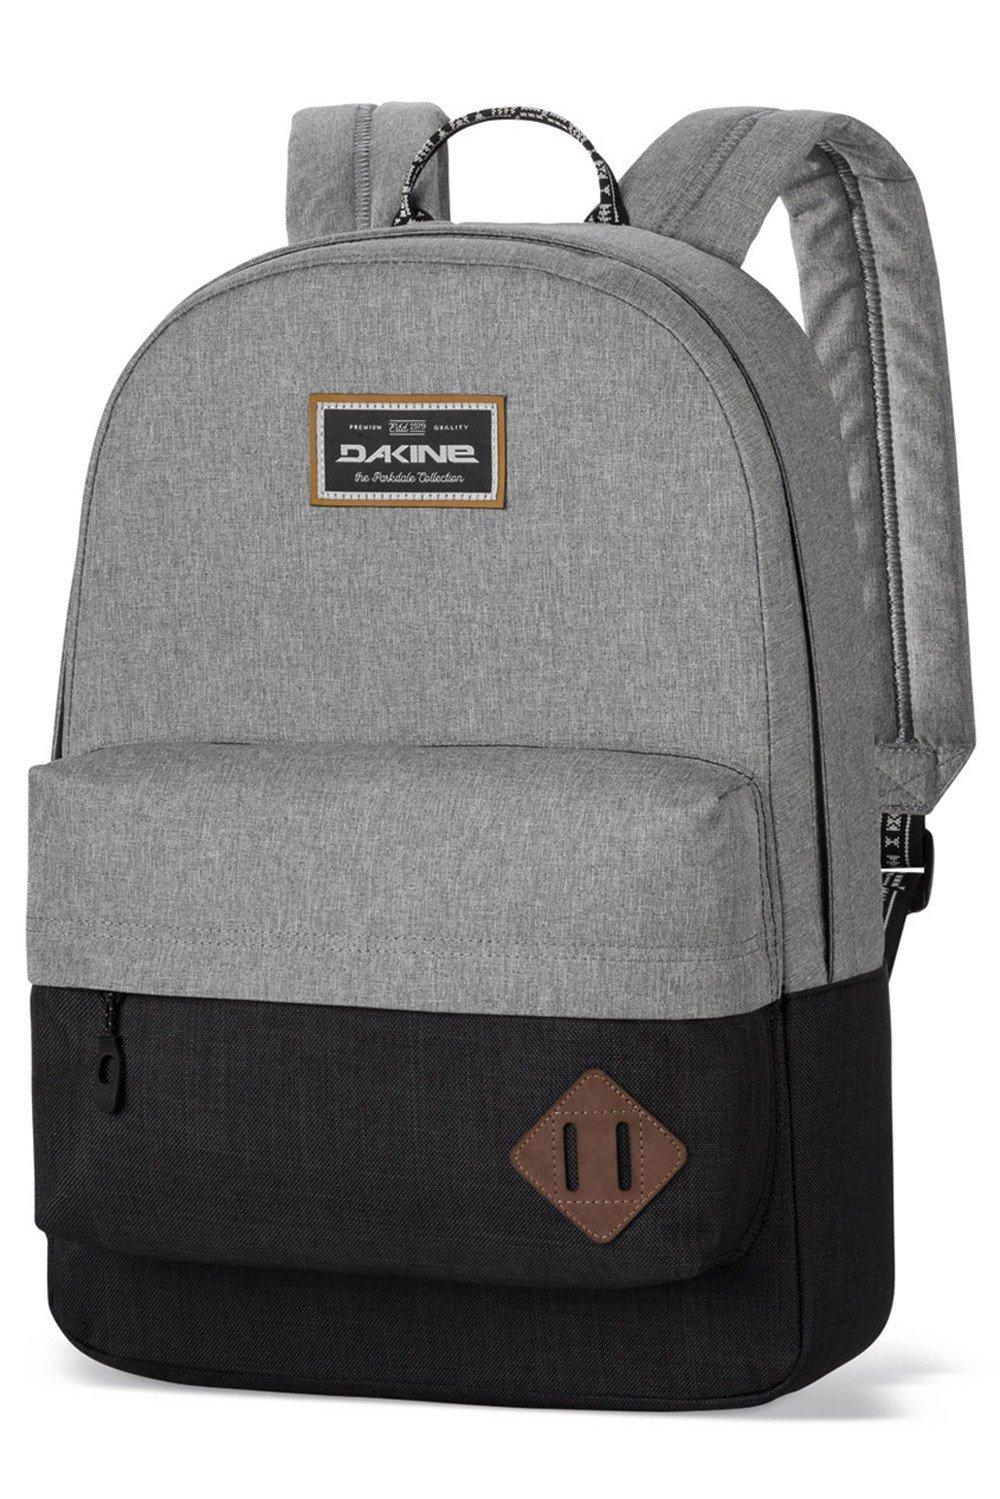 Dakine 365 21L Laptop Backpack One Size Sellwood